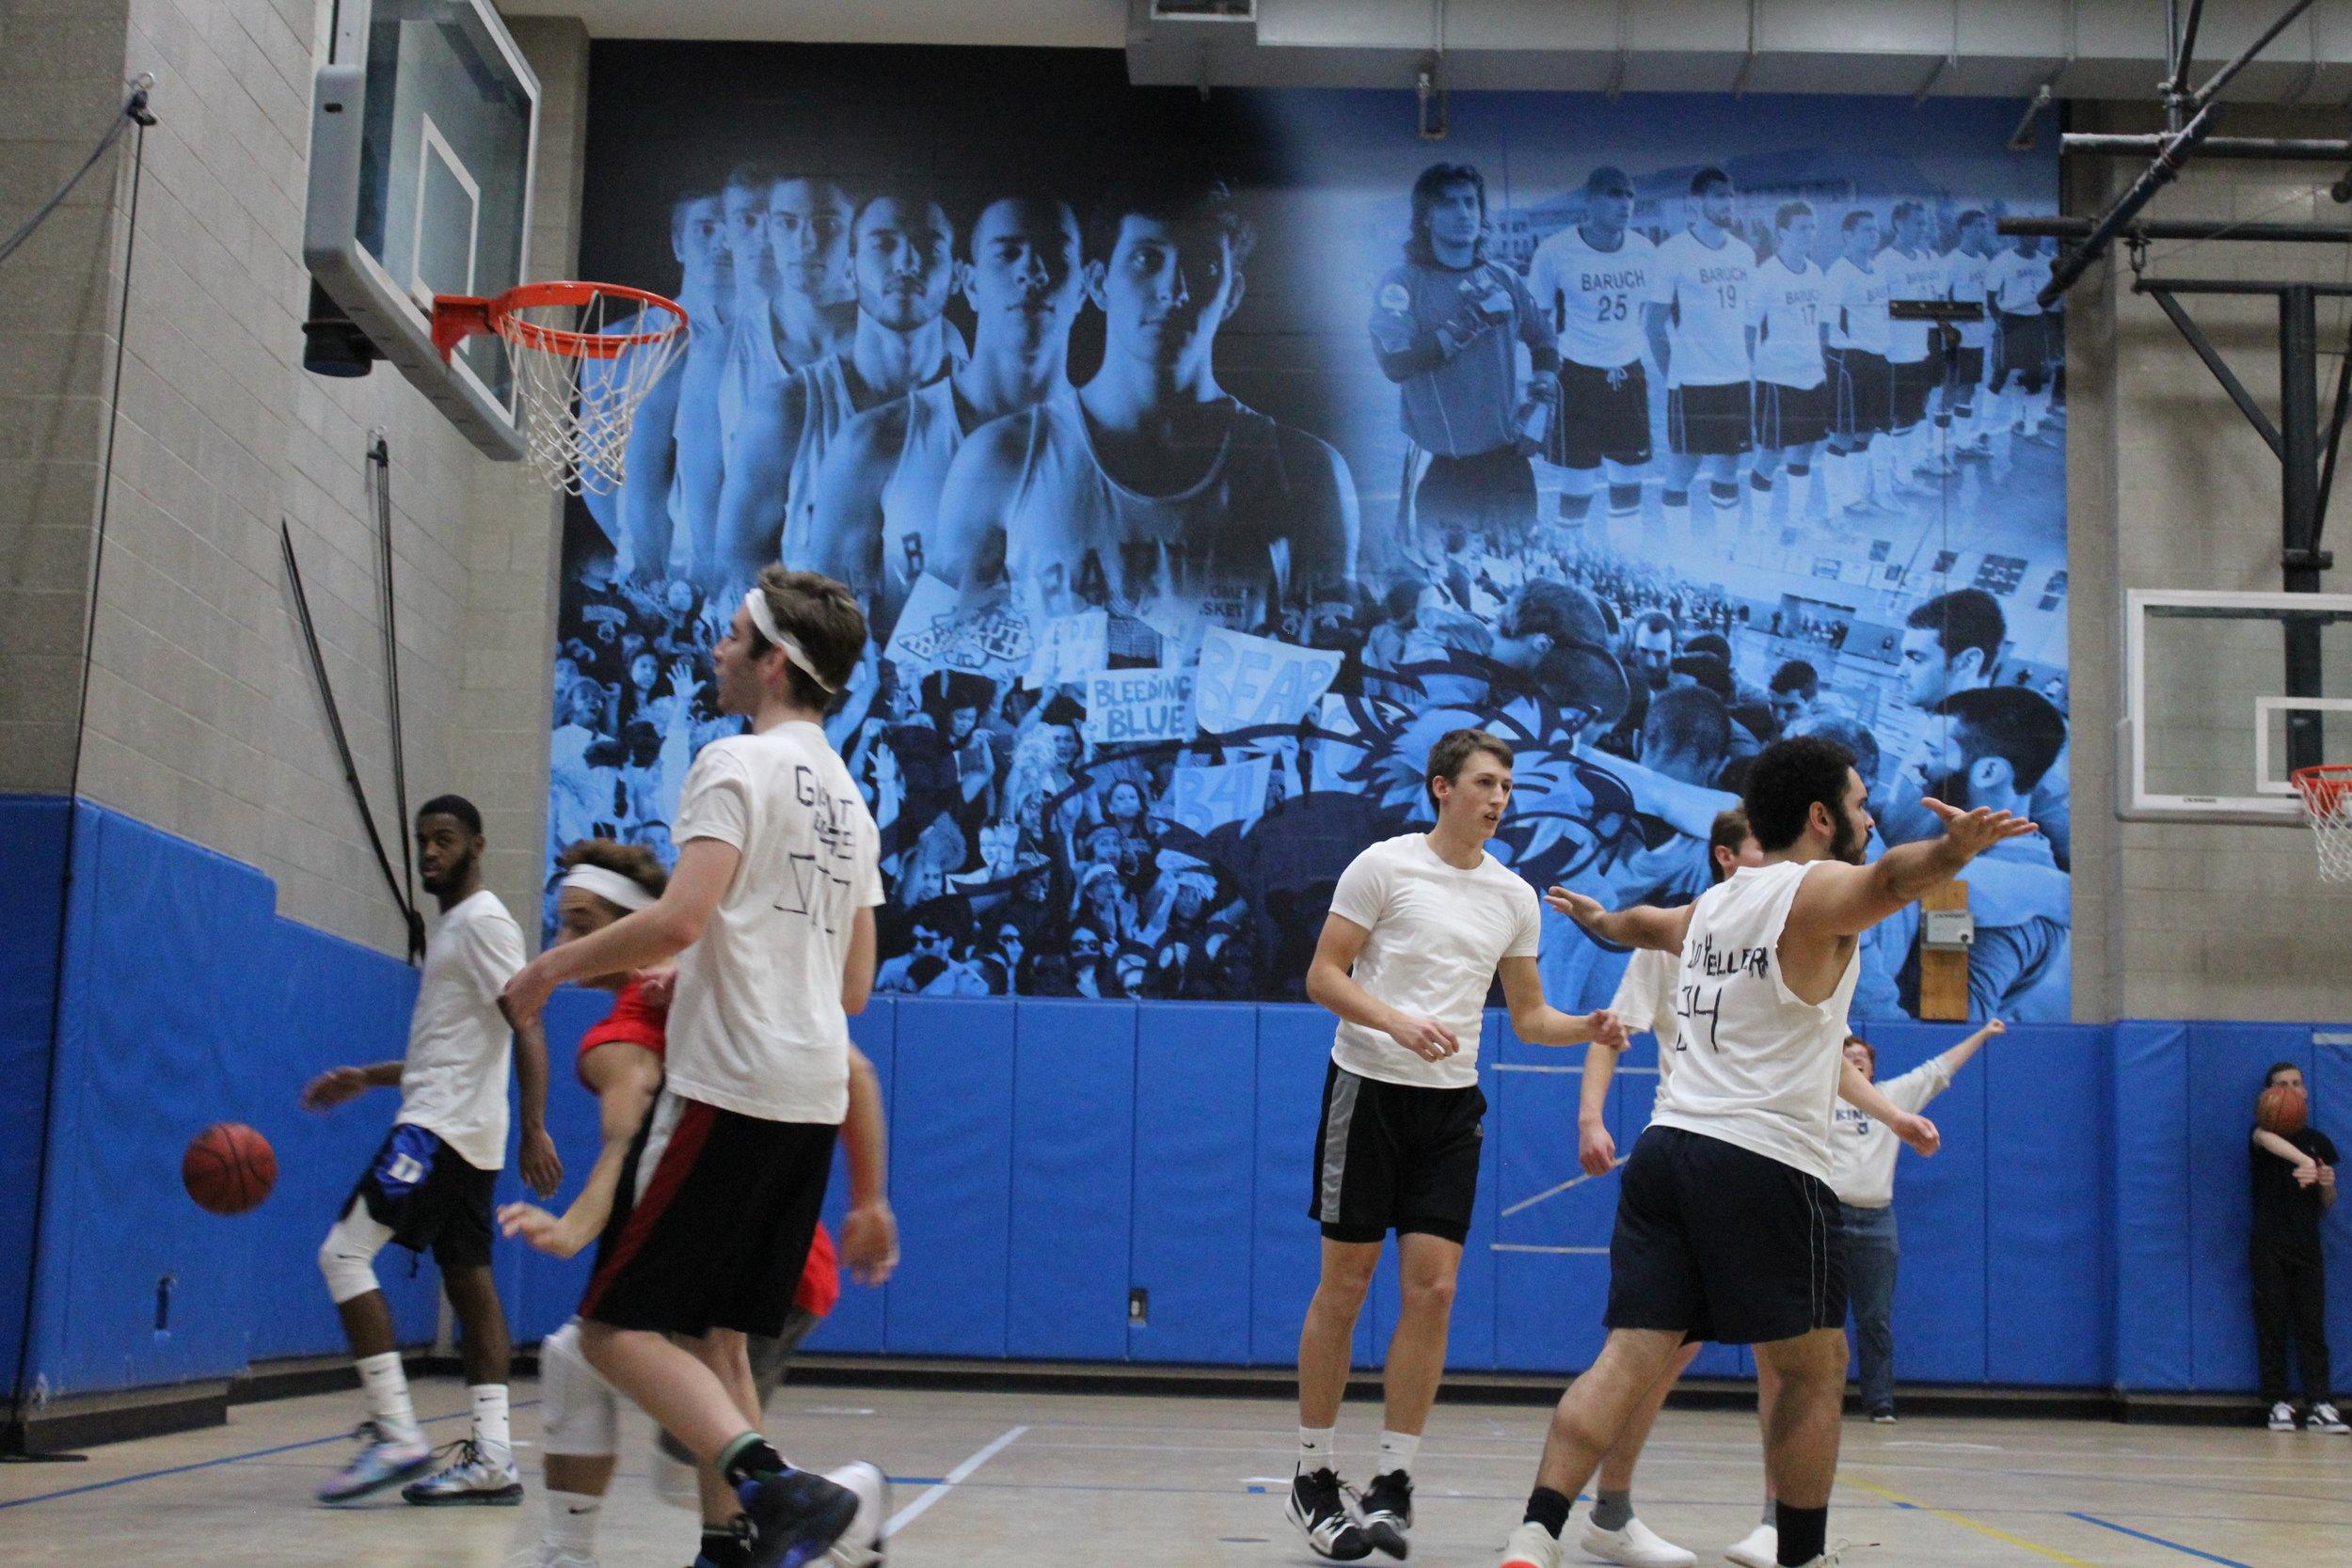 House of Churchill playing basketball. || Photo credit: Elizabeth Winn